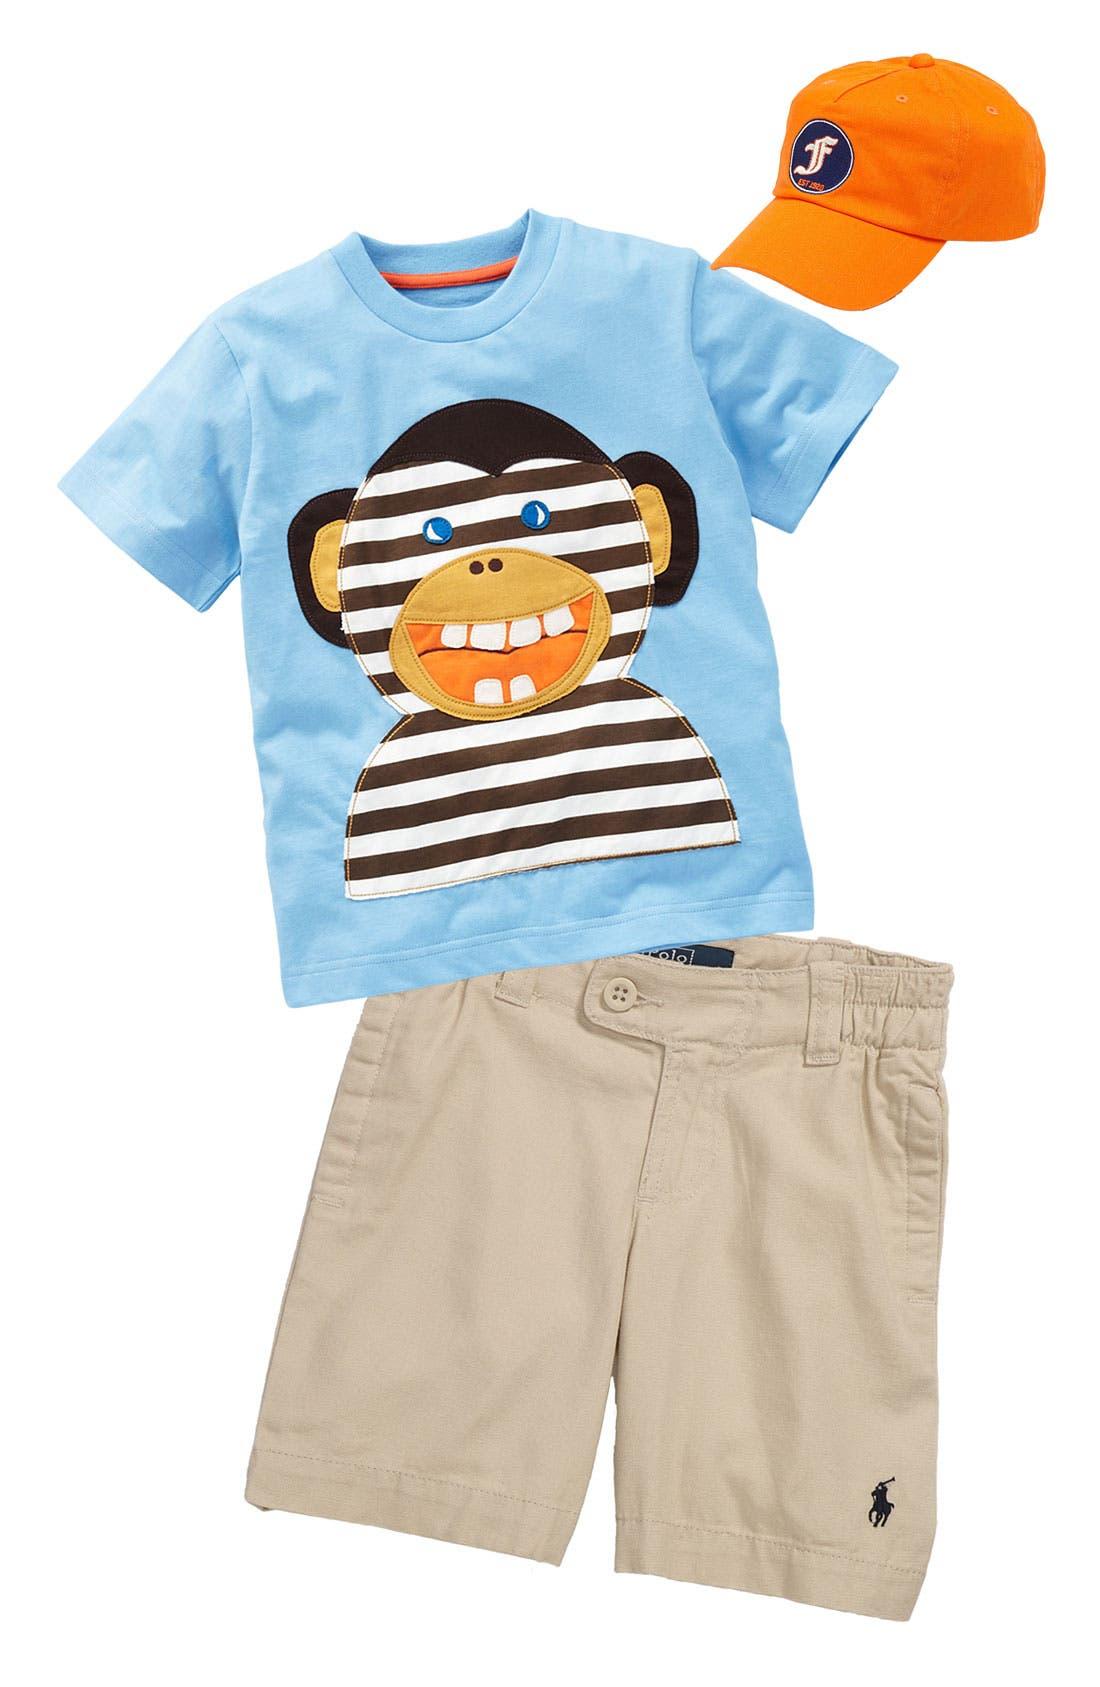 Alternate Image 1 Selected - Mini Boden T-Shirt & Ralph Lauren Shorts (Toddler)